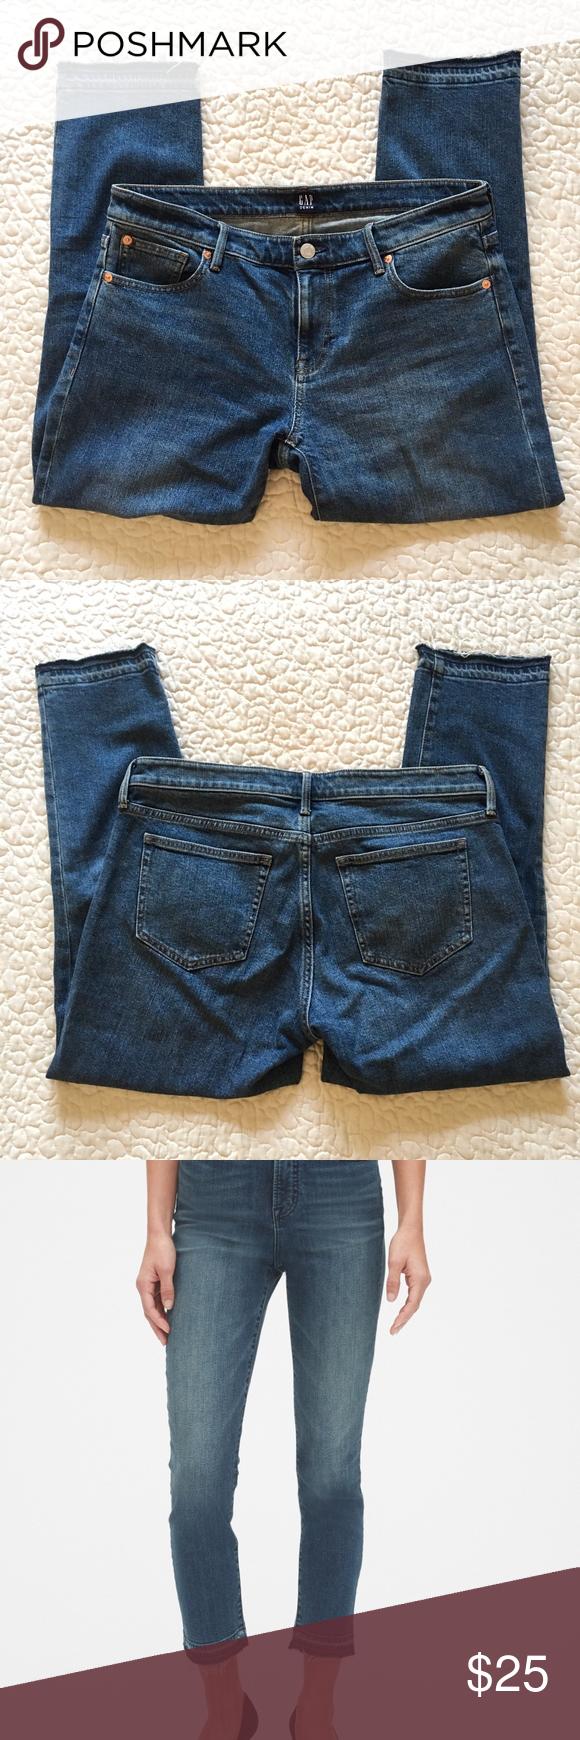 Gap mid rise skinny cropped jeans w/raw hem Cropped